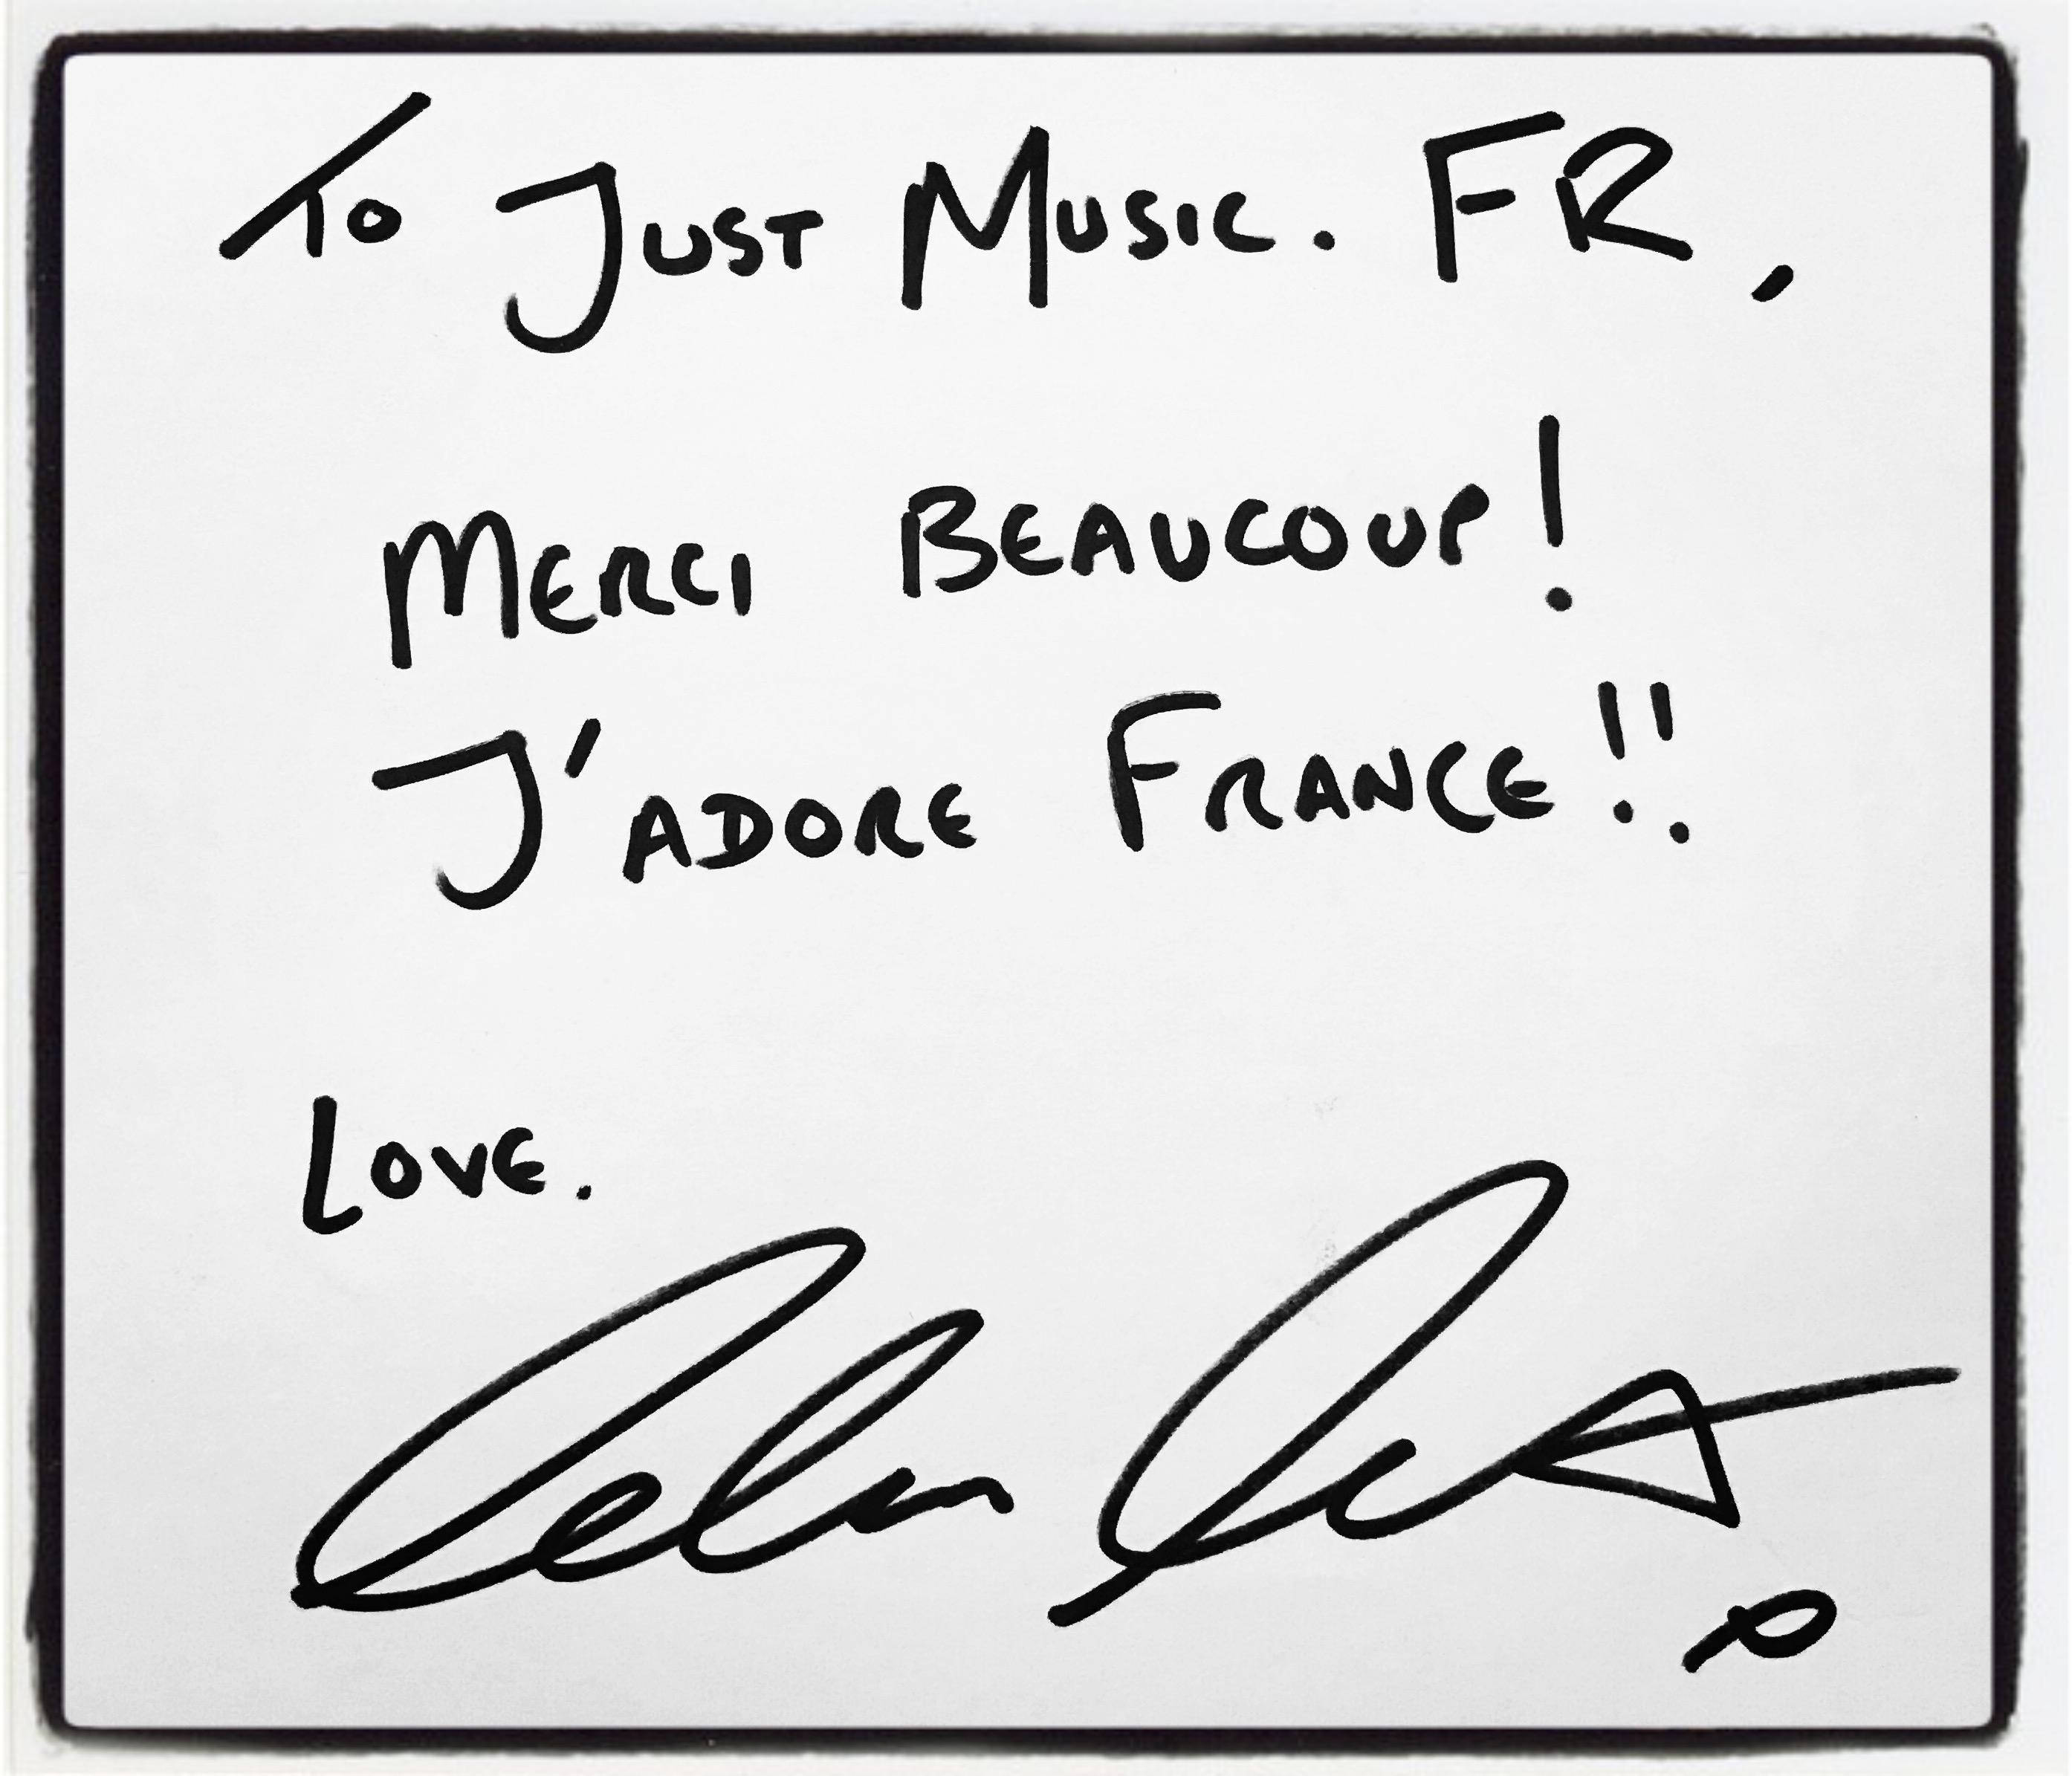 Calum Scott Dédicace JustMusic.fr